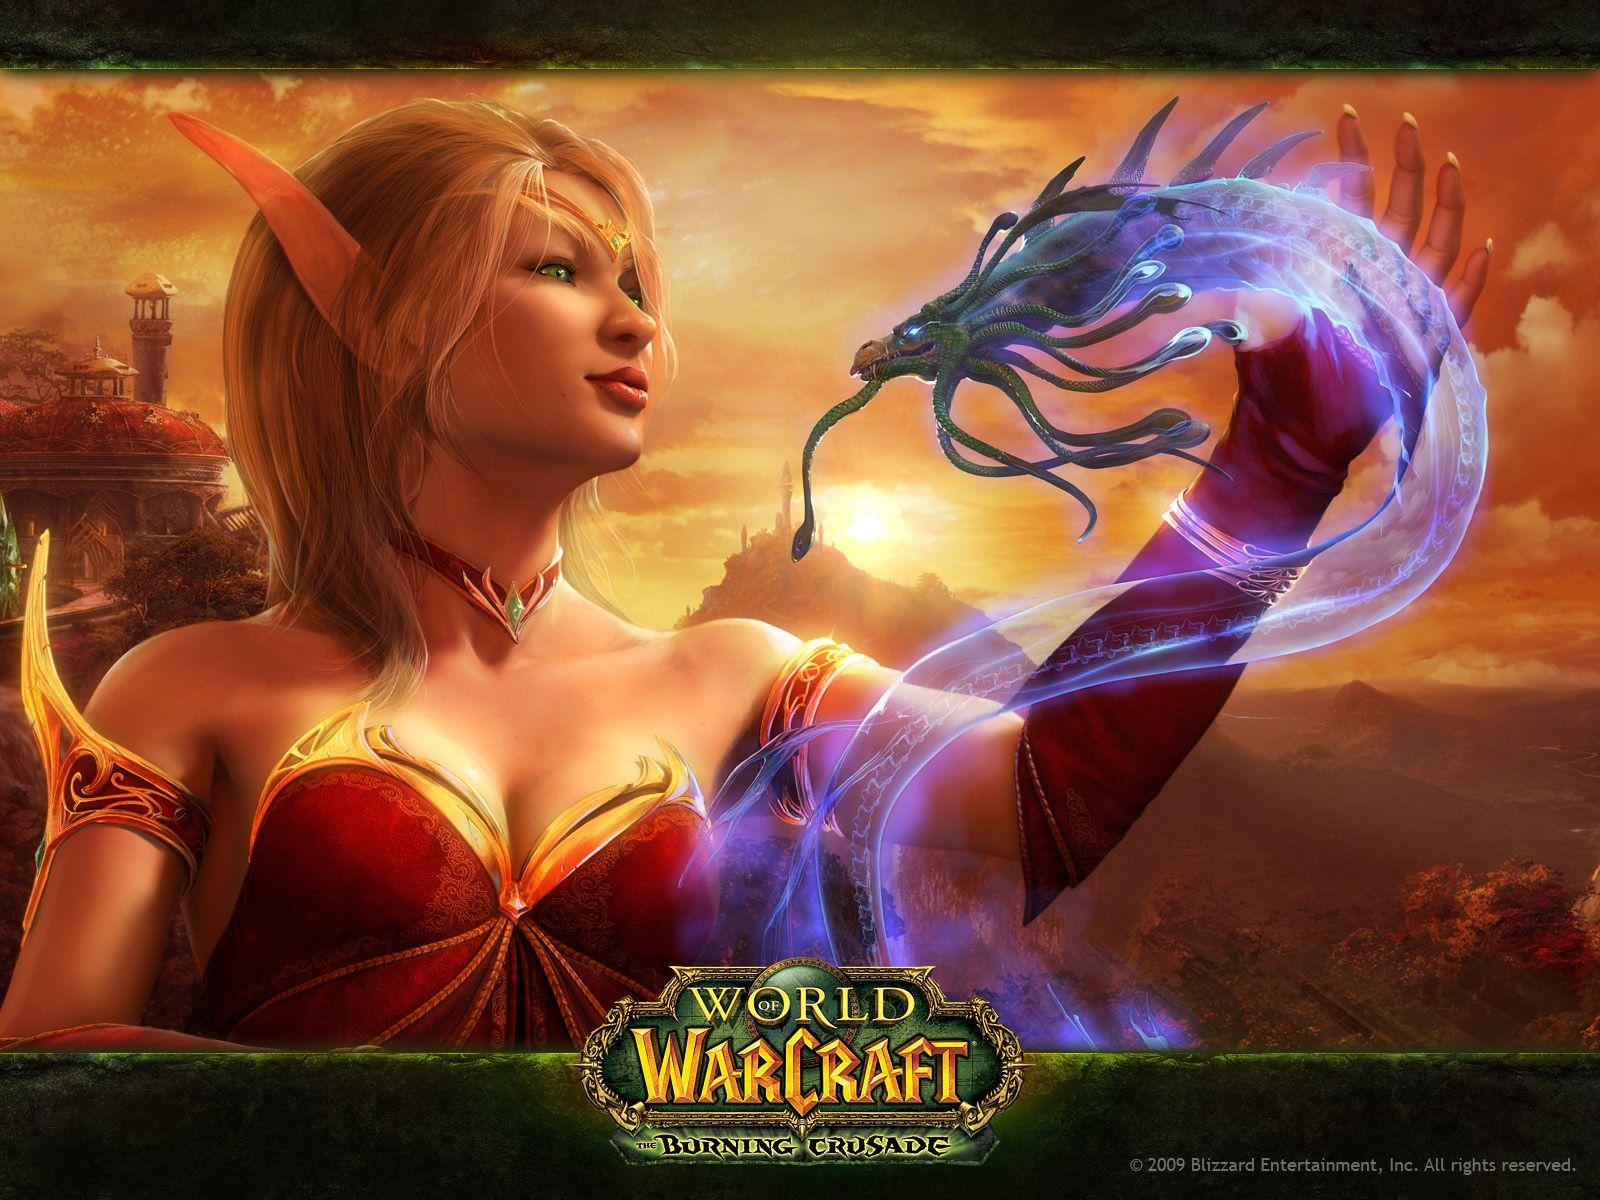 Fond D'écran World Of Warcraft Gratuit